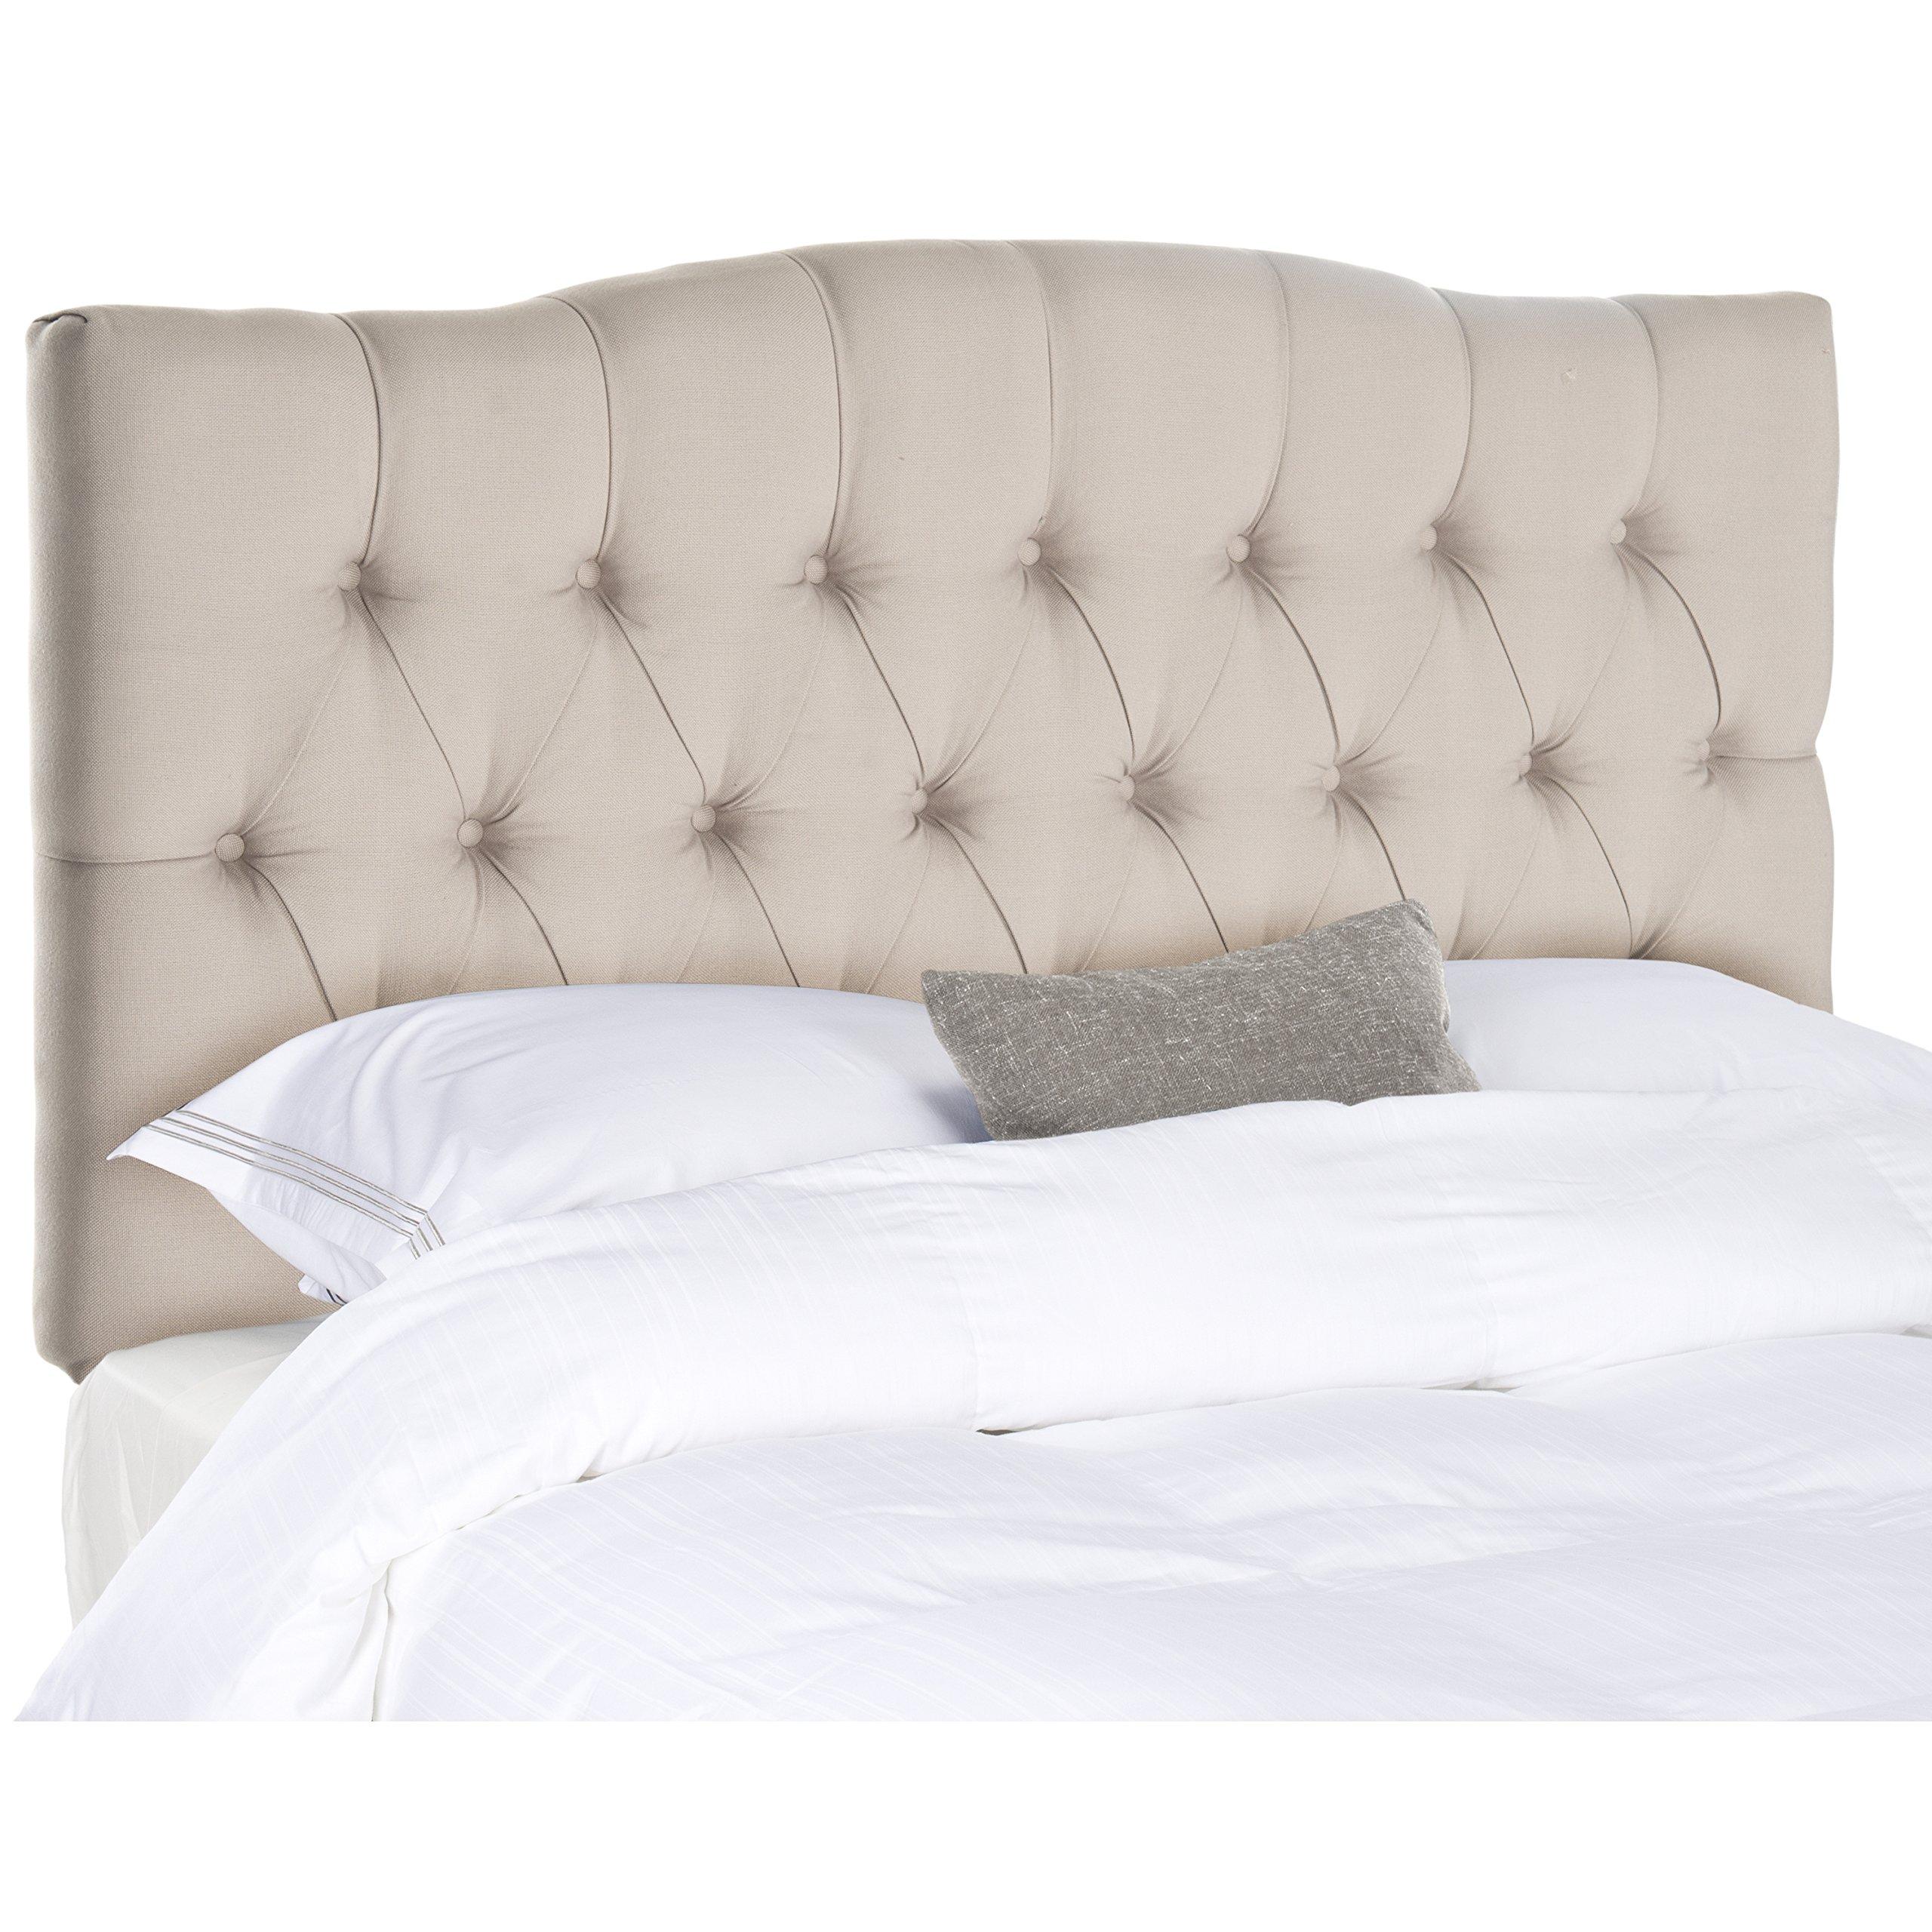 Safavieh Axel Taupe Linen Upholstered Tufted Headboard (King)